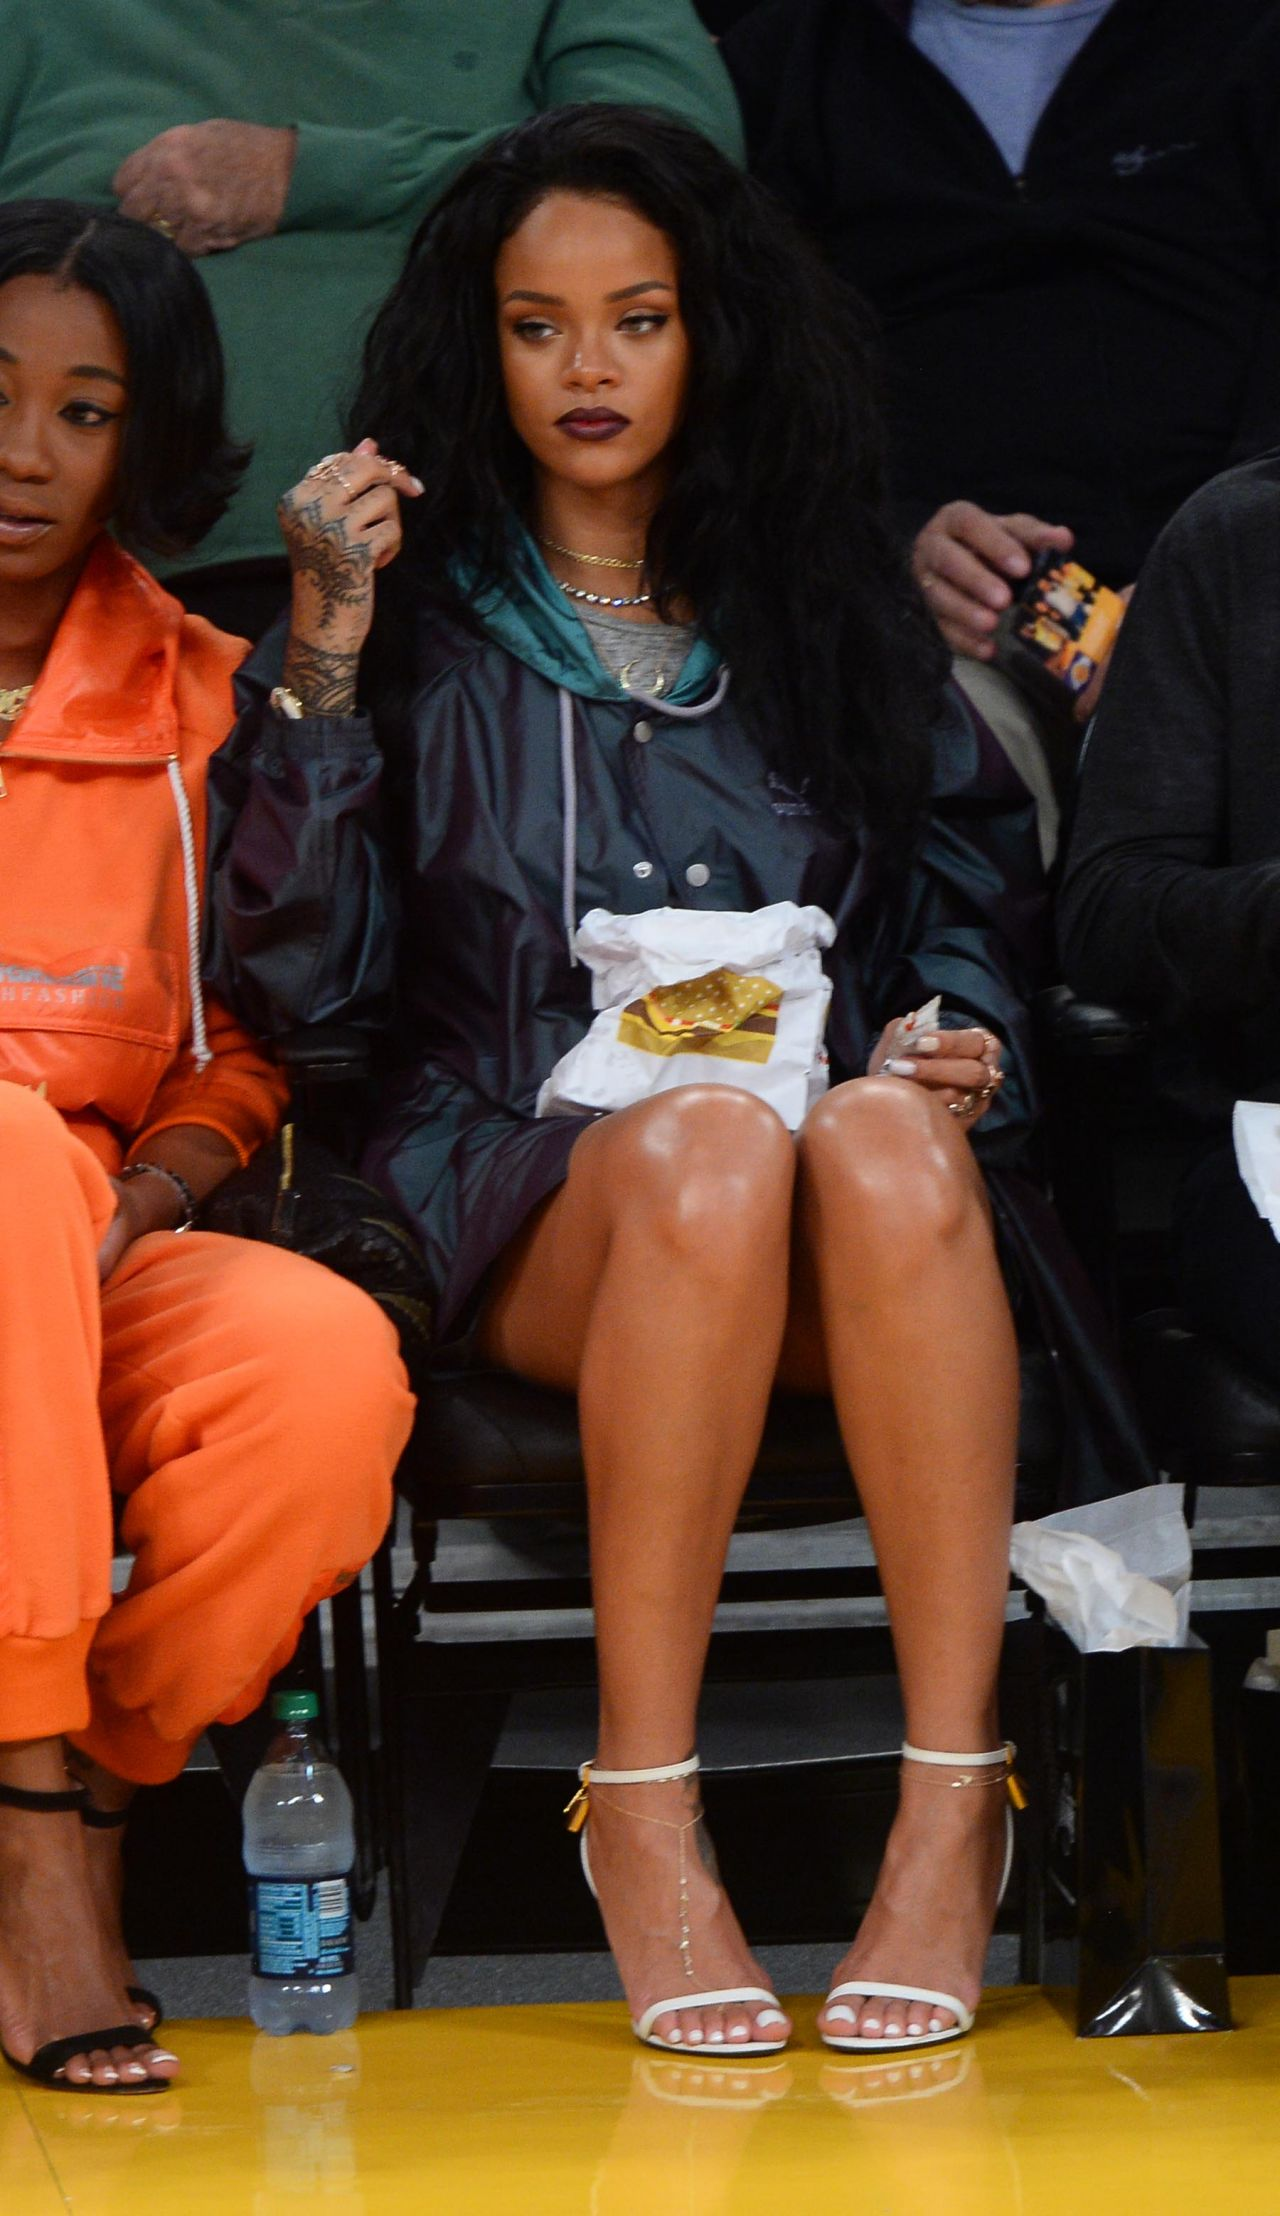 Rihanna La Lakers Vs Cleveland Cavaliers Game In Los